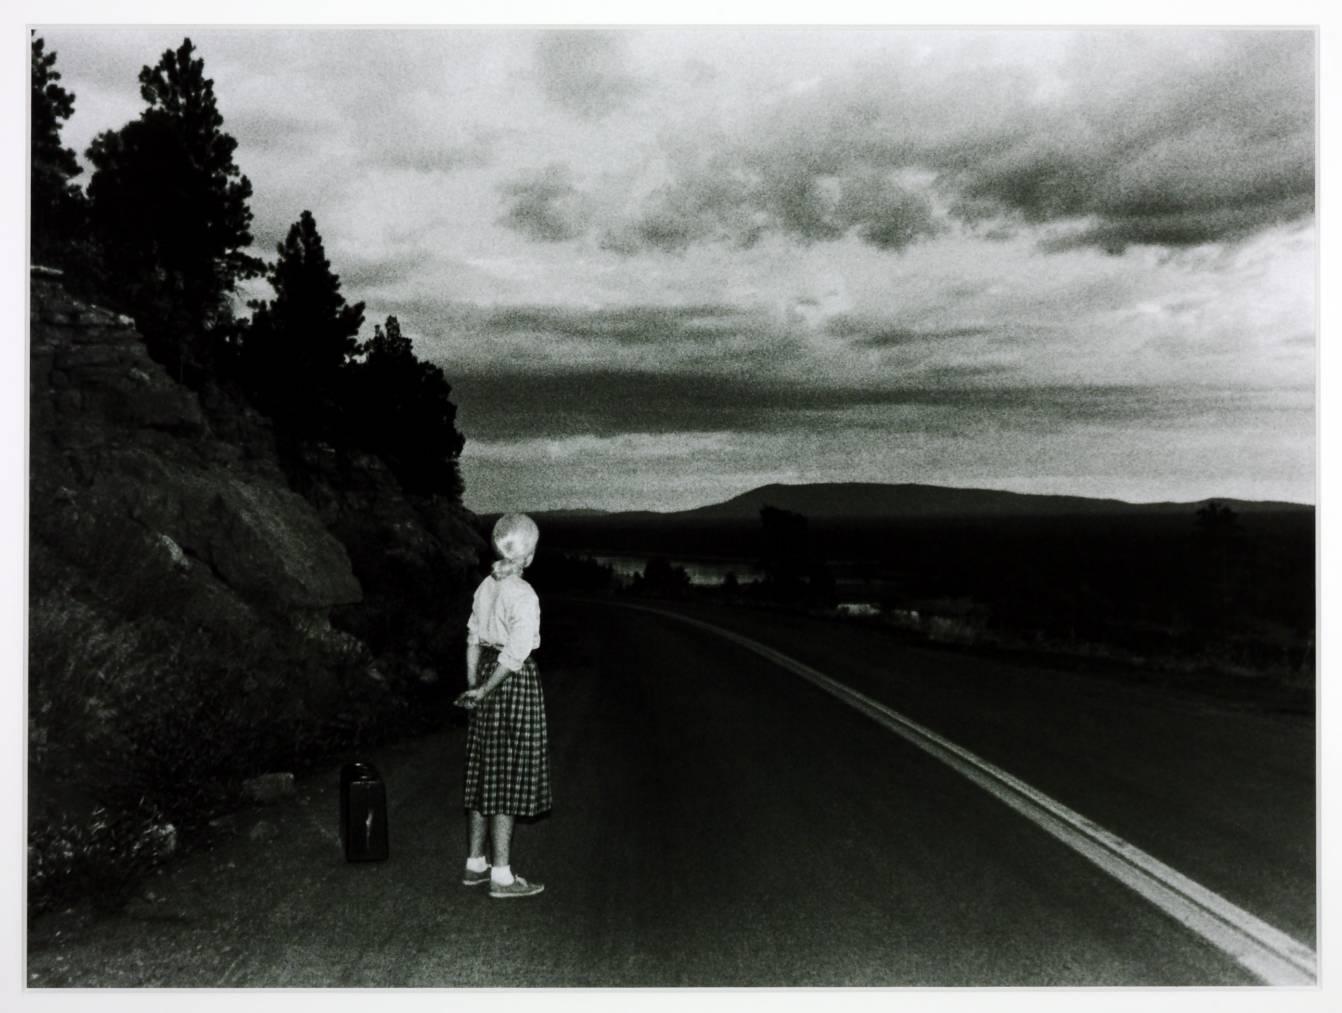 7.<br />Fotó: Cindy Sherman: Untitled Film Still #48 (1979)<br />$2,965,000<br />May 13, 2015<br />Christie's New York